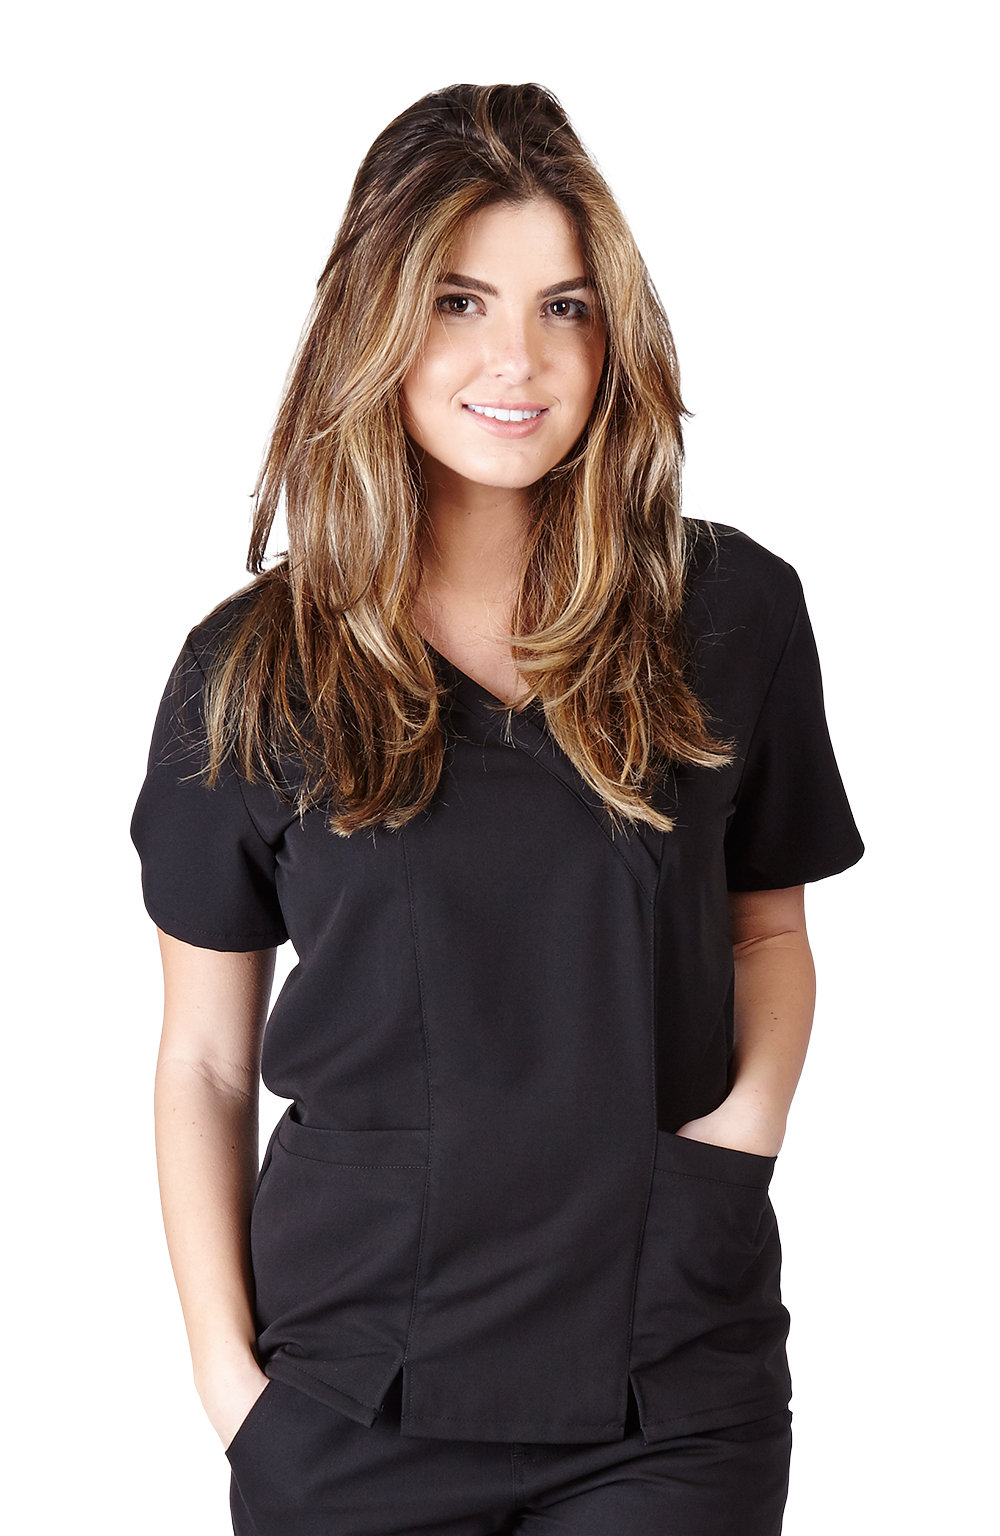 Ultra-Soft-Medical-Nurse-Uniform-Premium-Womens-Junior-Fit-Cross-Over-Scrub-Top